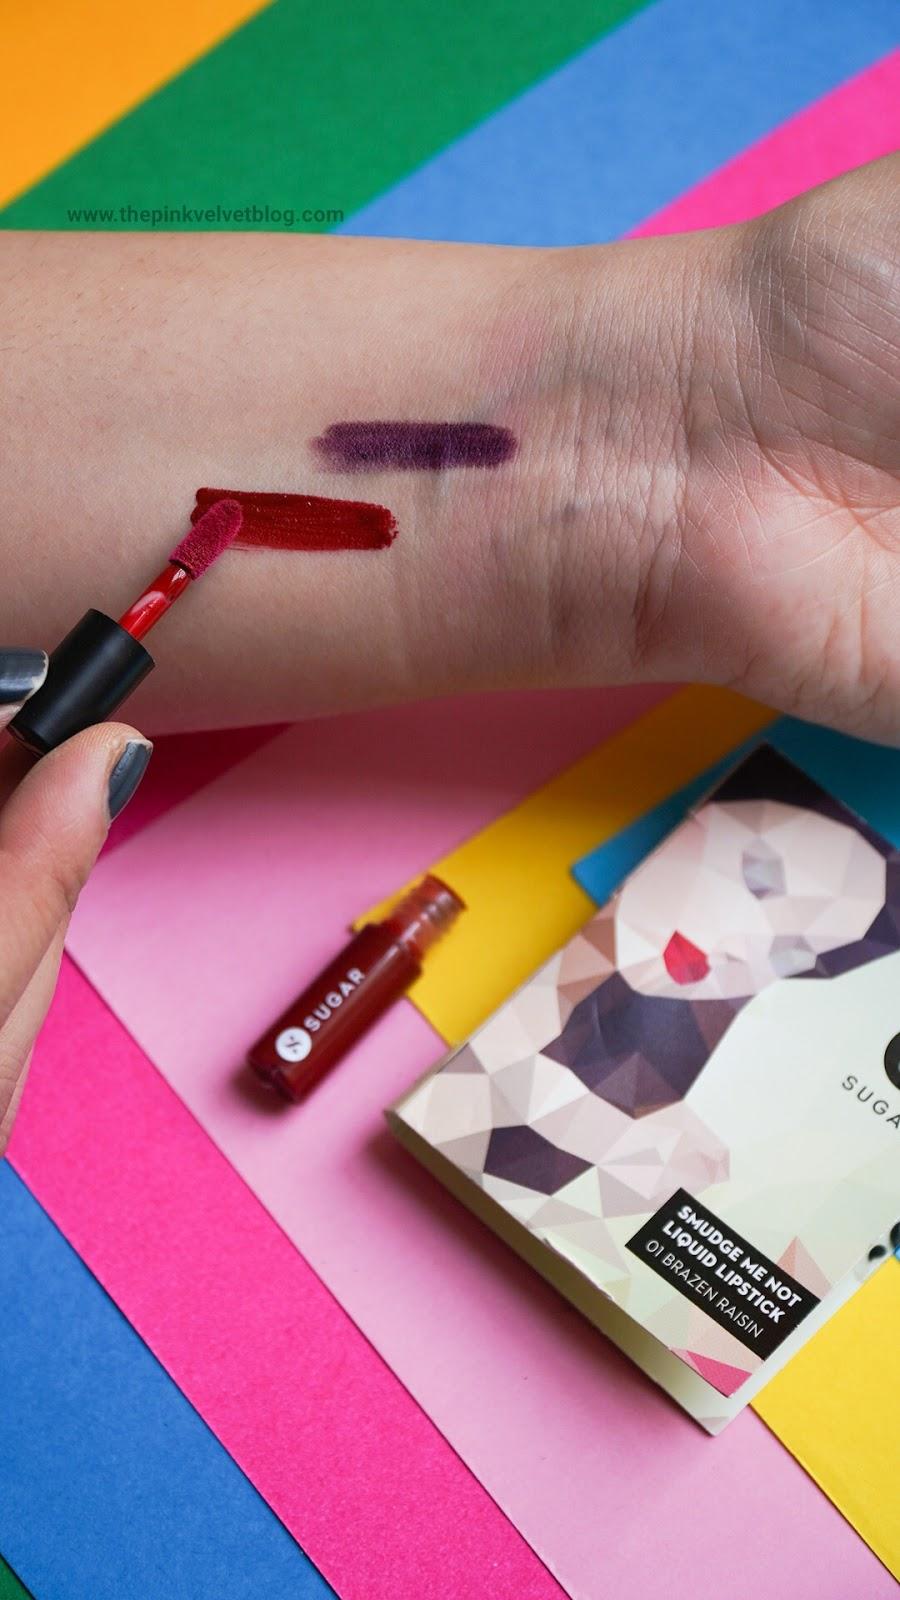 SUGAR Smudge Me Not Liquid Lipstick Sample - 01 Brazen Raisin Swatch - November Fab Bag